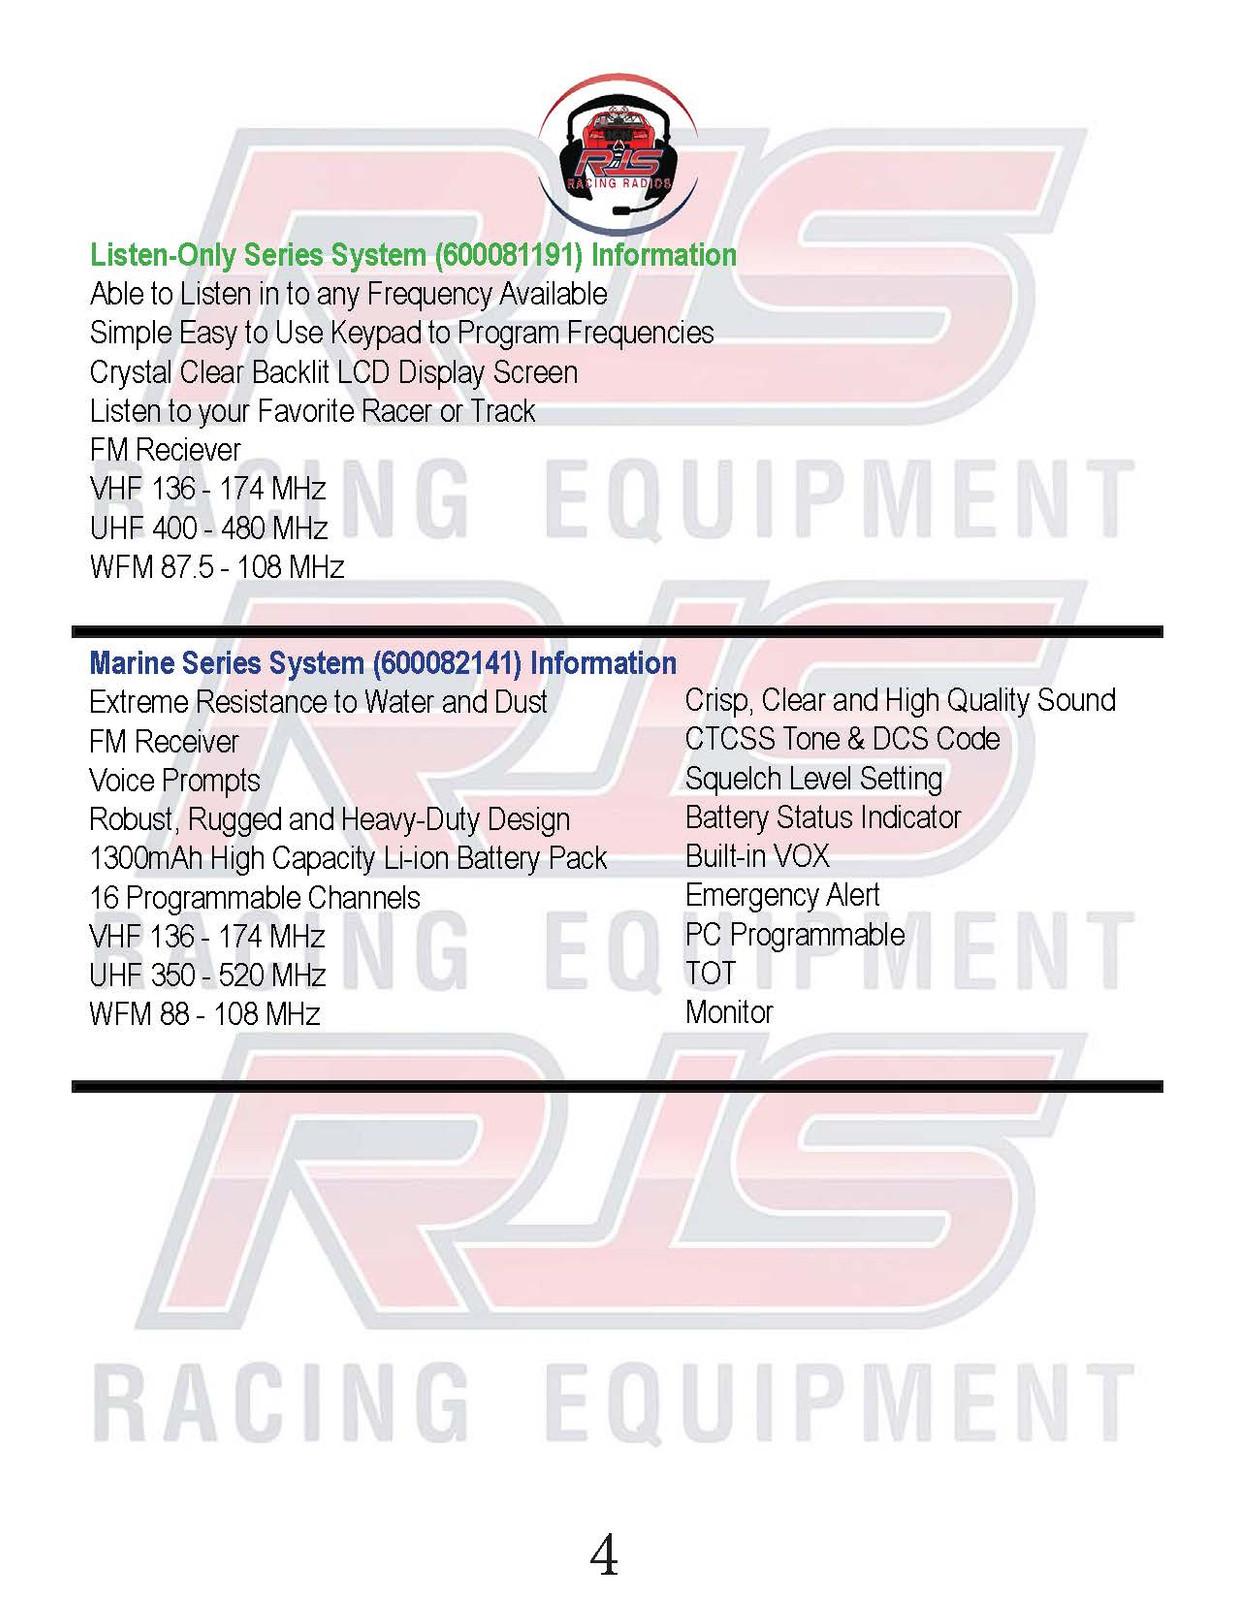 RJS RADIOS CATALOG PAGE-_Page_04 jpg